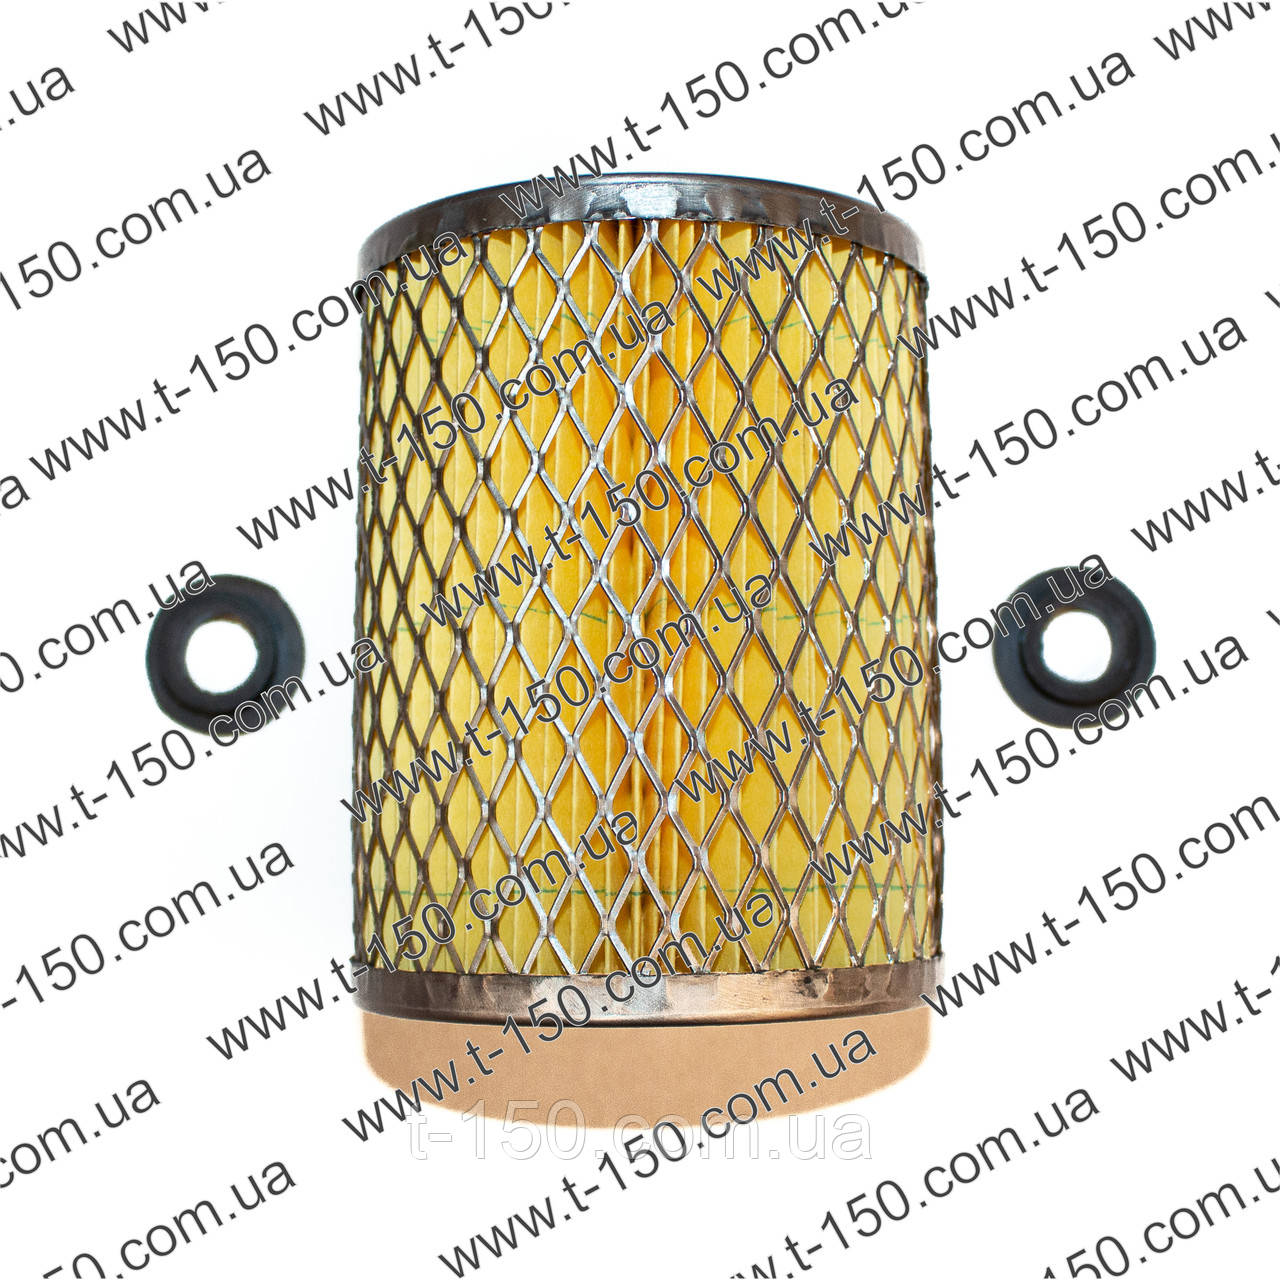 Элемент фильтра топлива Т-150, ДТ-75, ДОН, НИВА РД-001